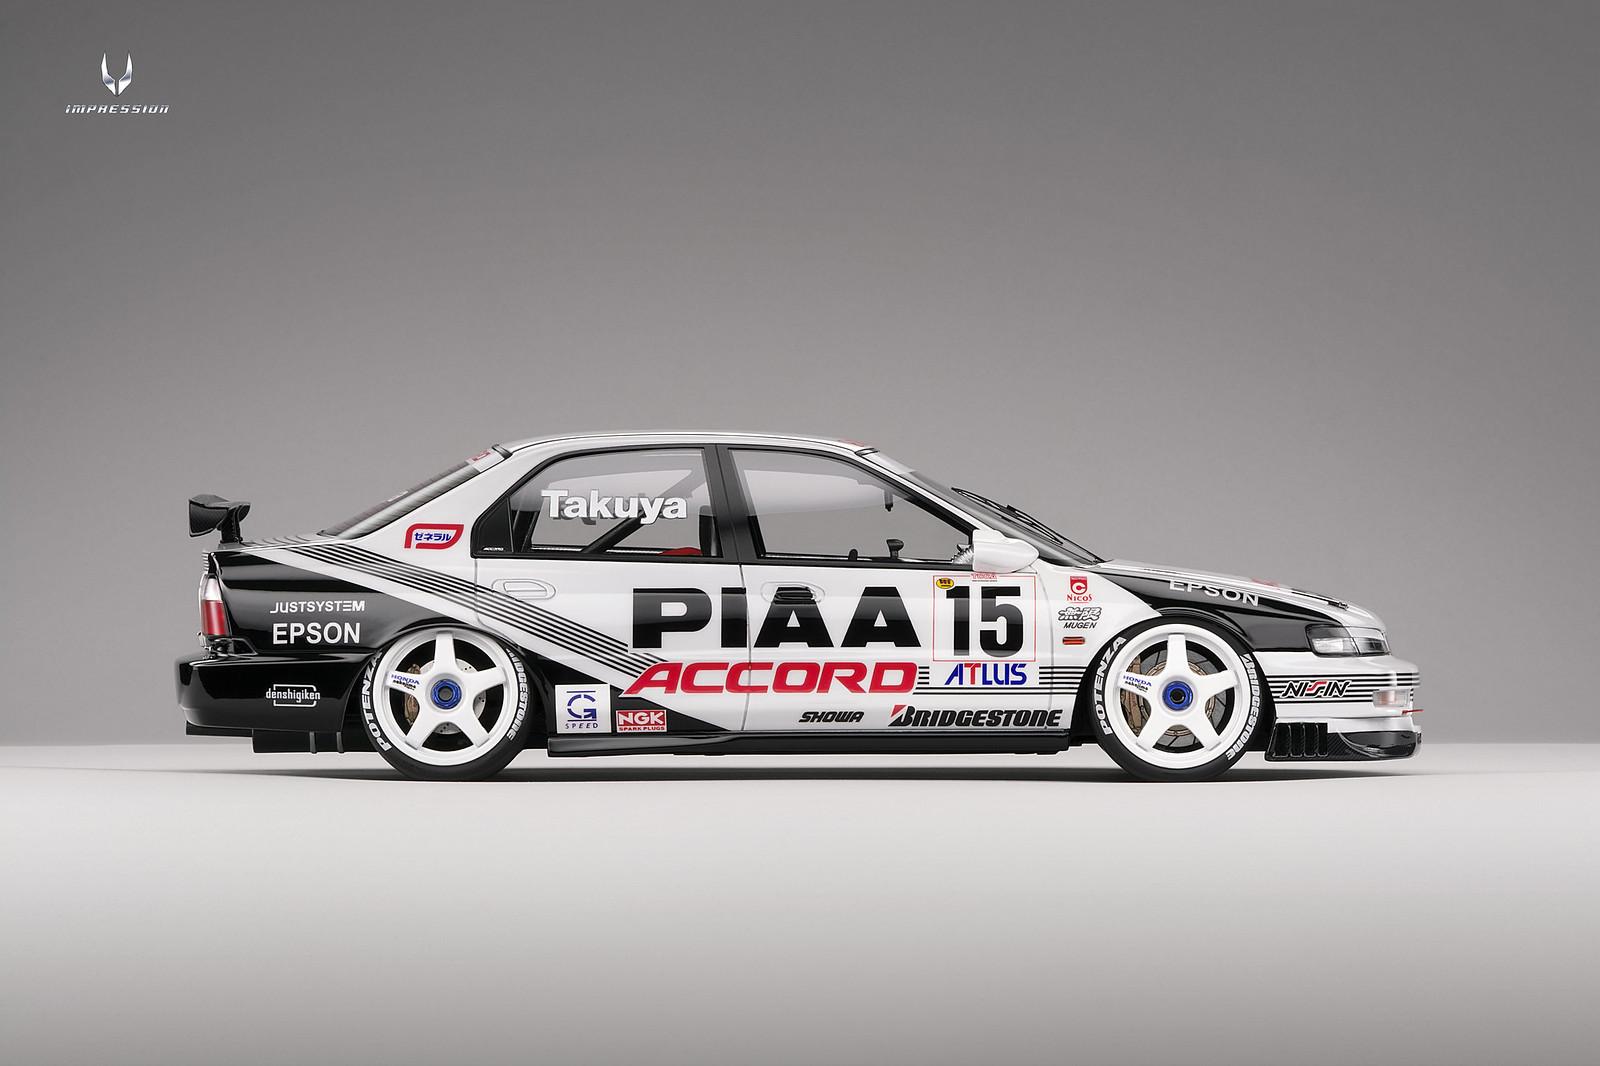 1 18 Honda Accord Jtcc 1996 15 Piaa Inno Models Diecast